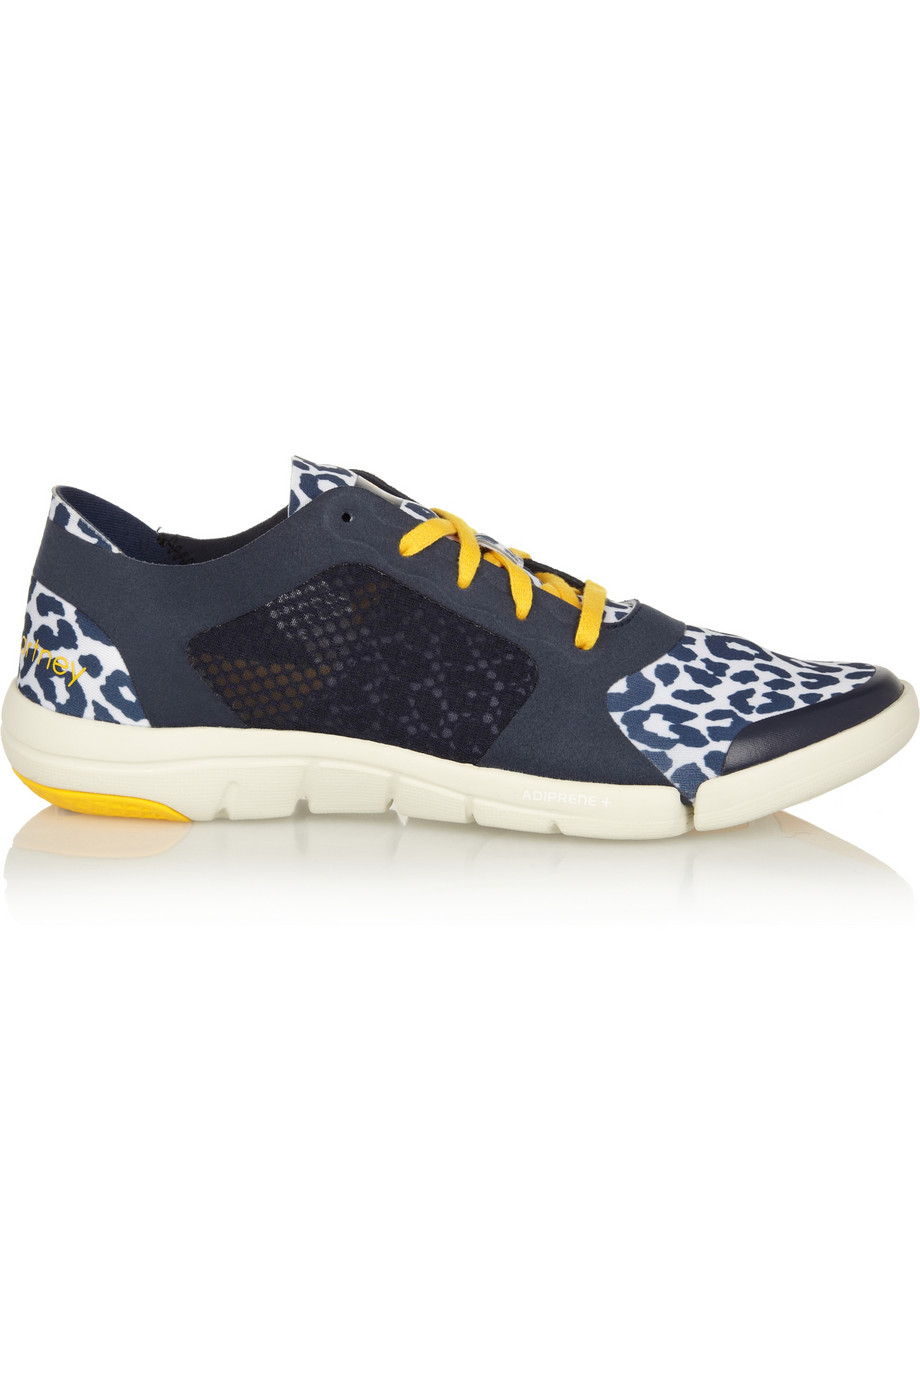 adidas by stella mccartney ararauna dance leopard print. Black Bedroom Furniture Sets. Home Design Ideas